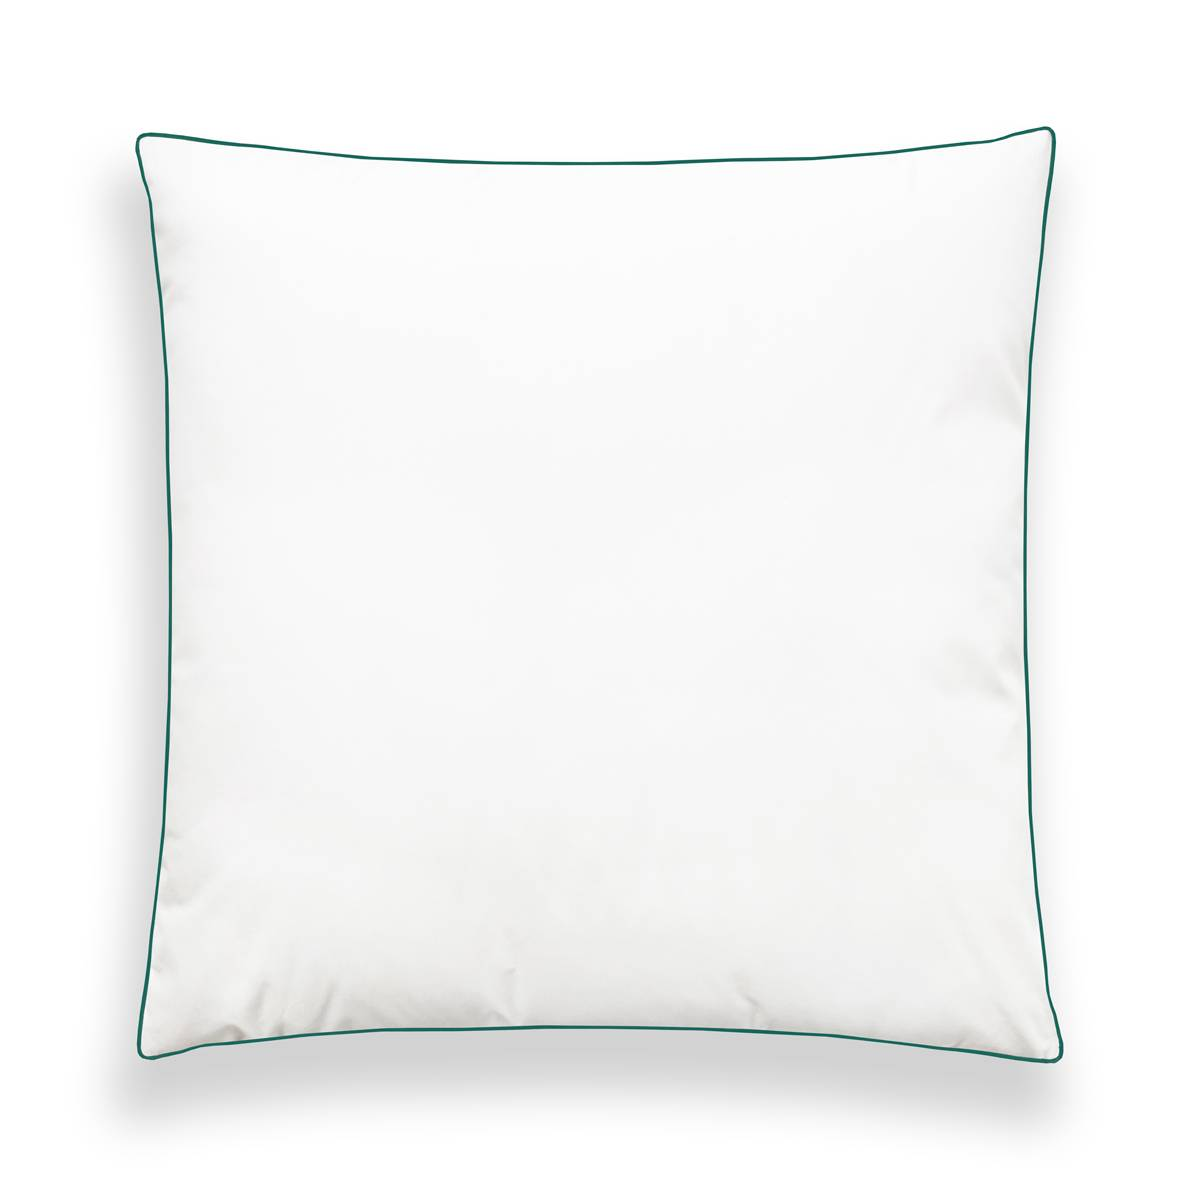 WAKE ME GREEN Oreiller MOELLEUX Respirant - Coton Bio  60x60 cm